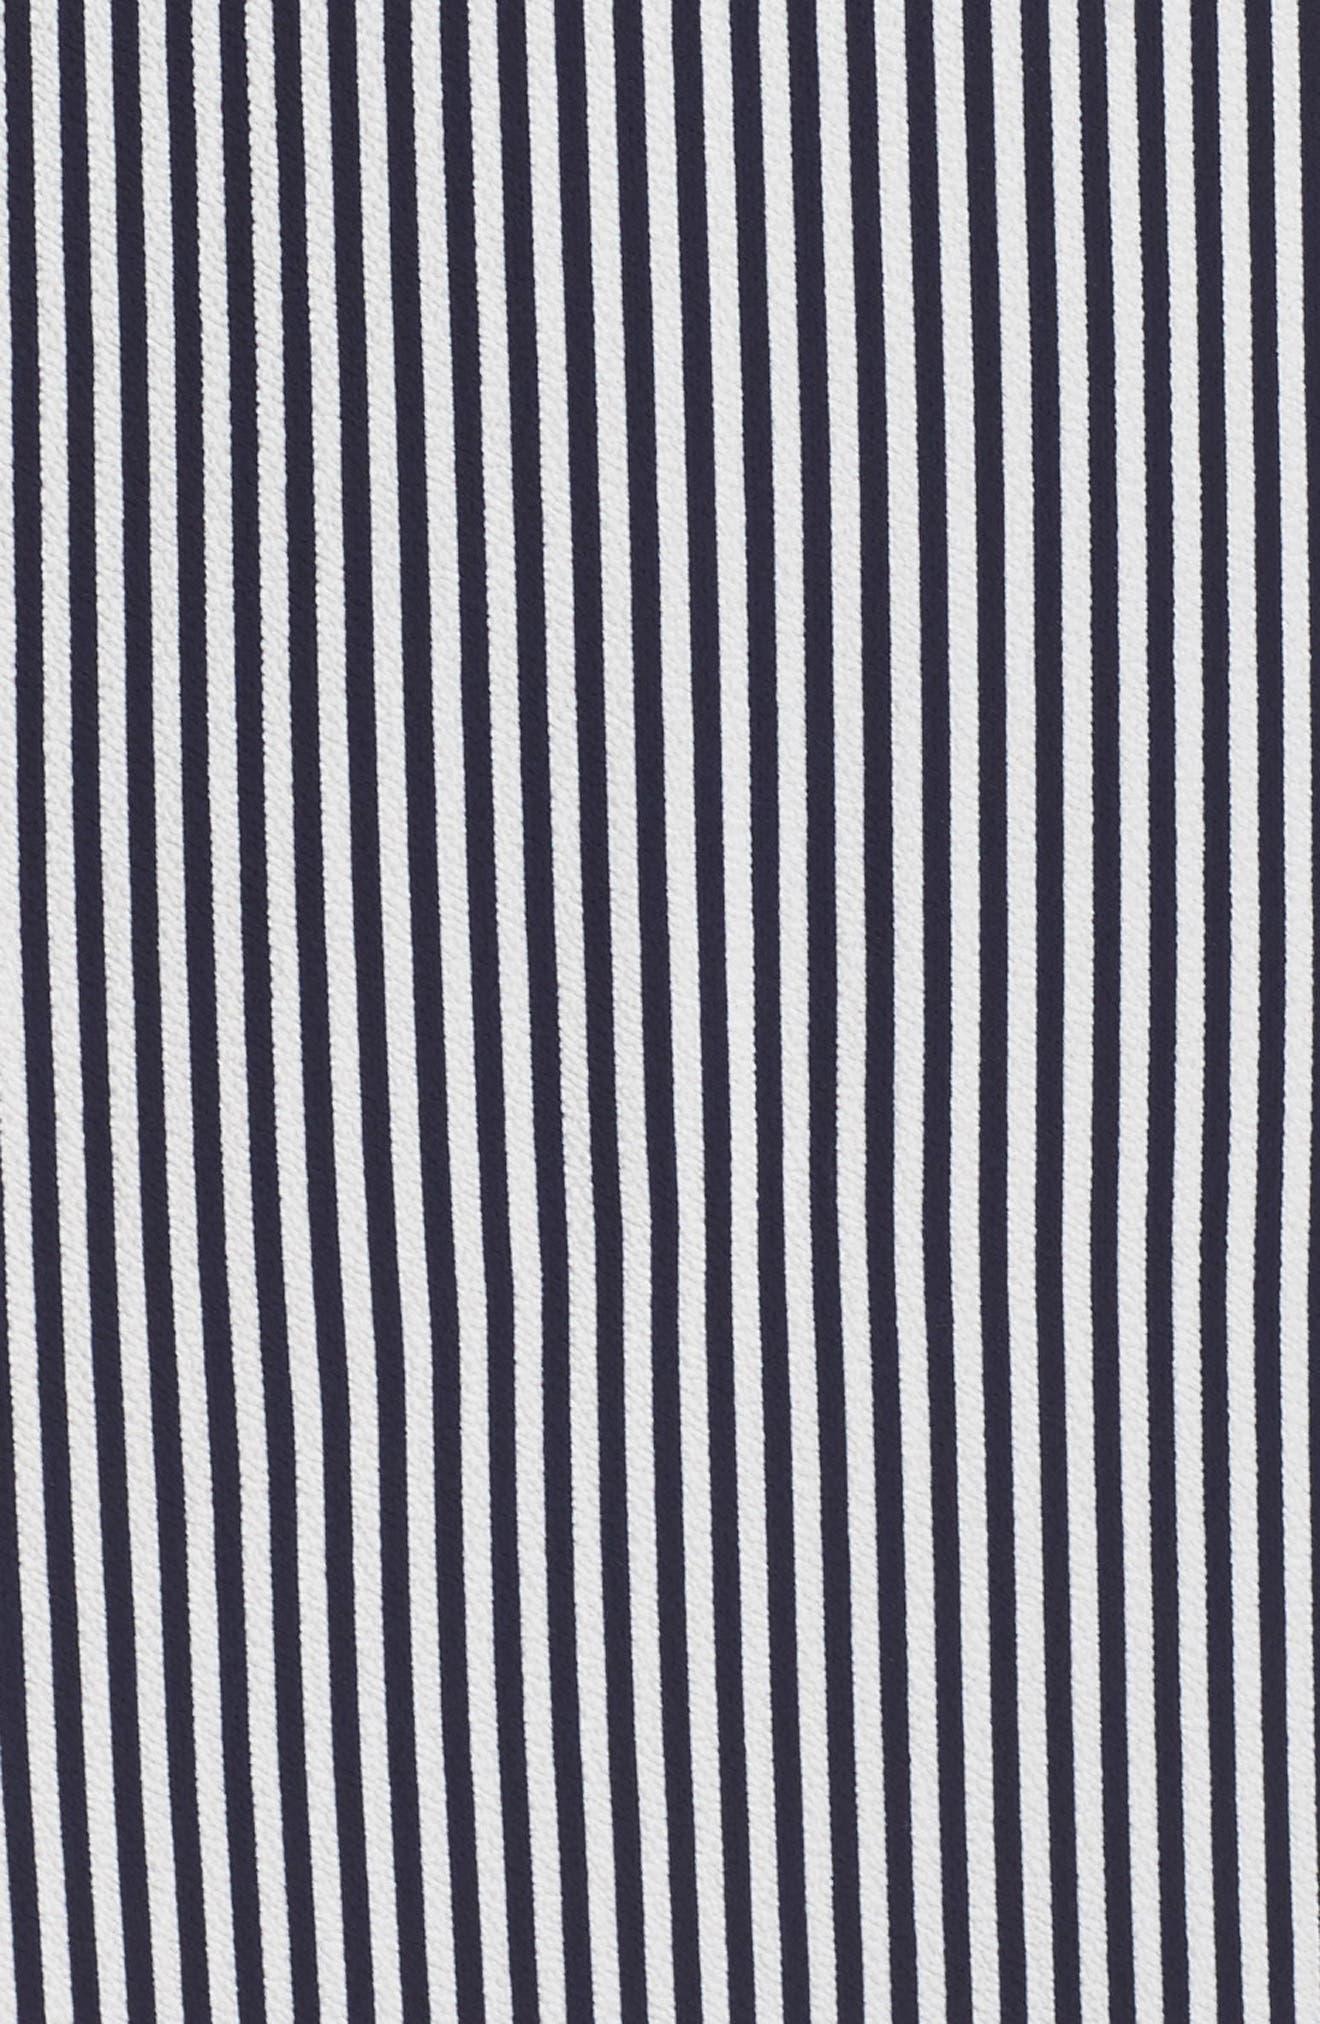 Stripe Stretch Maxi Dress,                             Alternate thumbnail 5, color,                             Navy